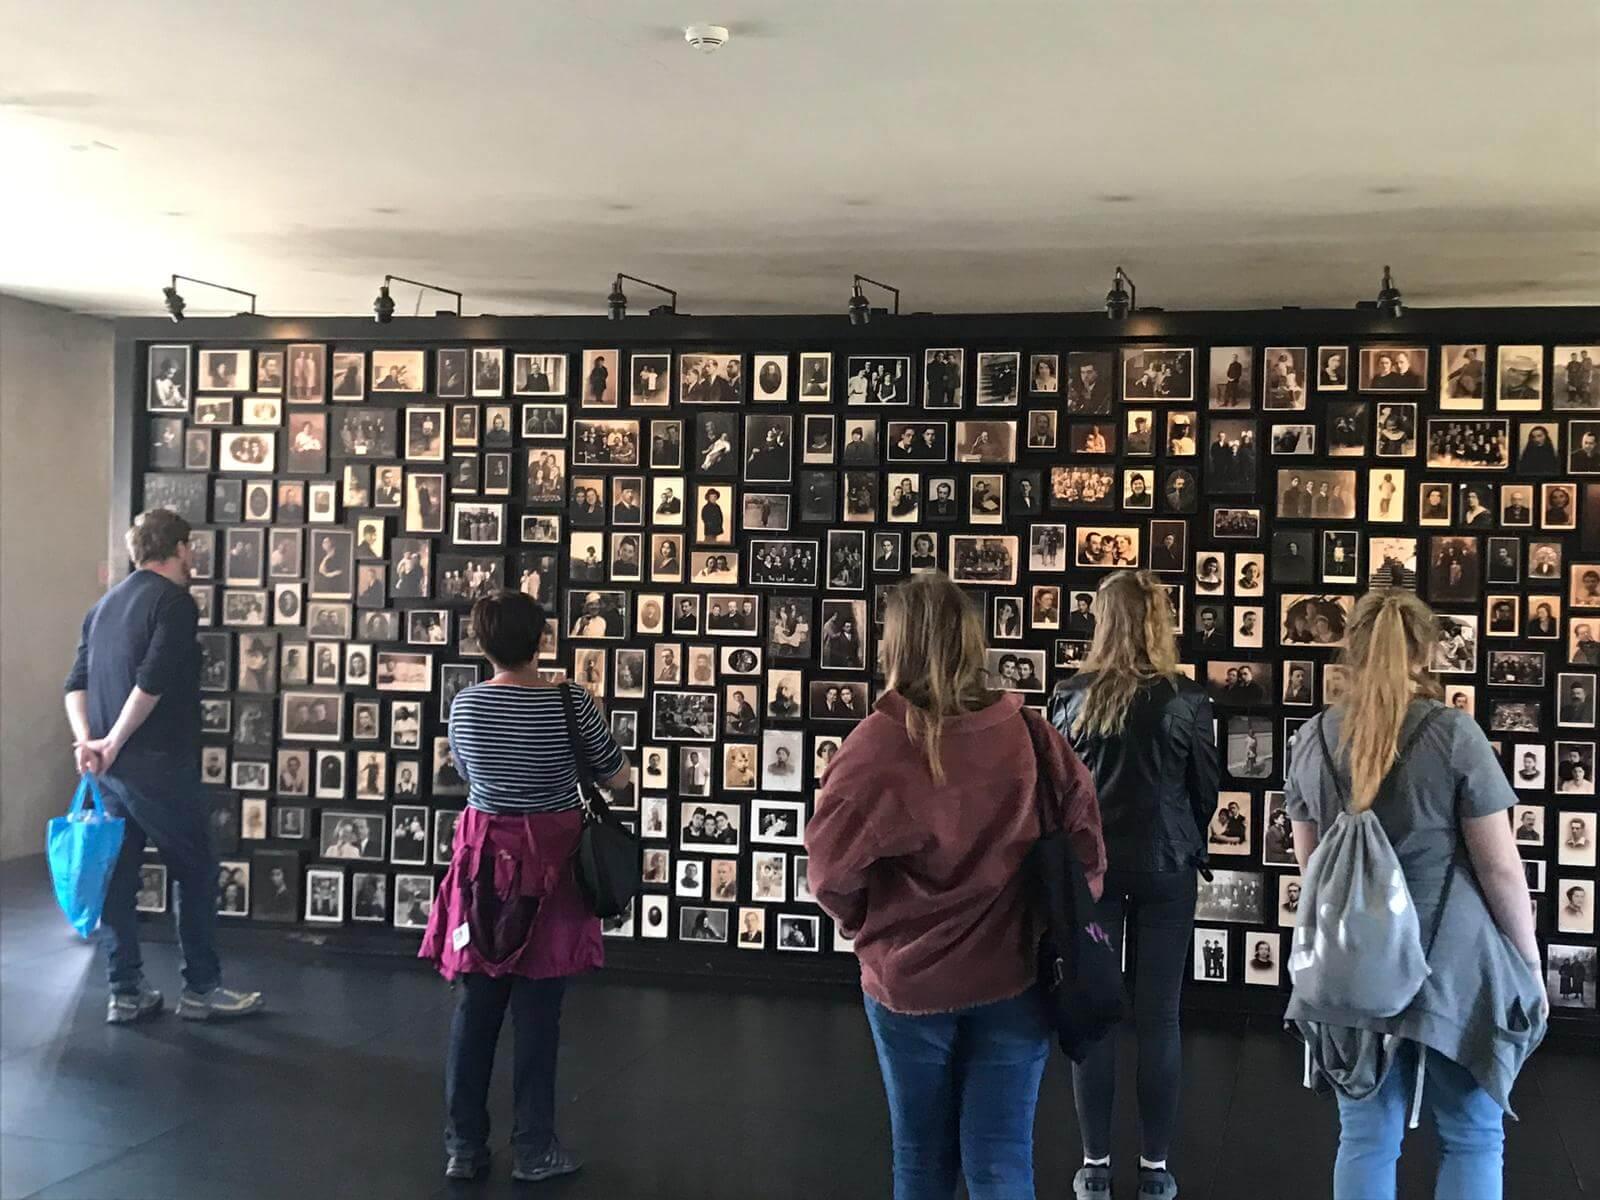 Auschwitzfahrt.jpg?auto=compress,format&colorquant=1600